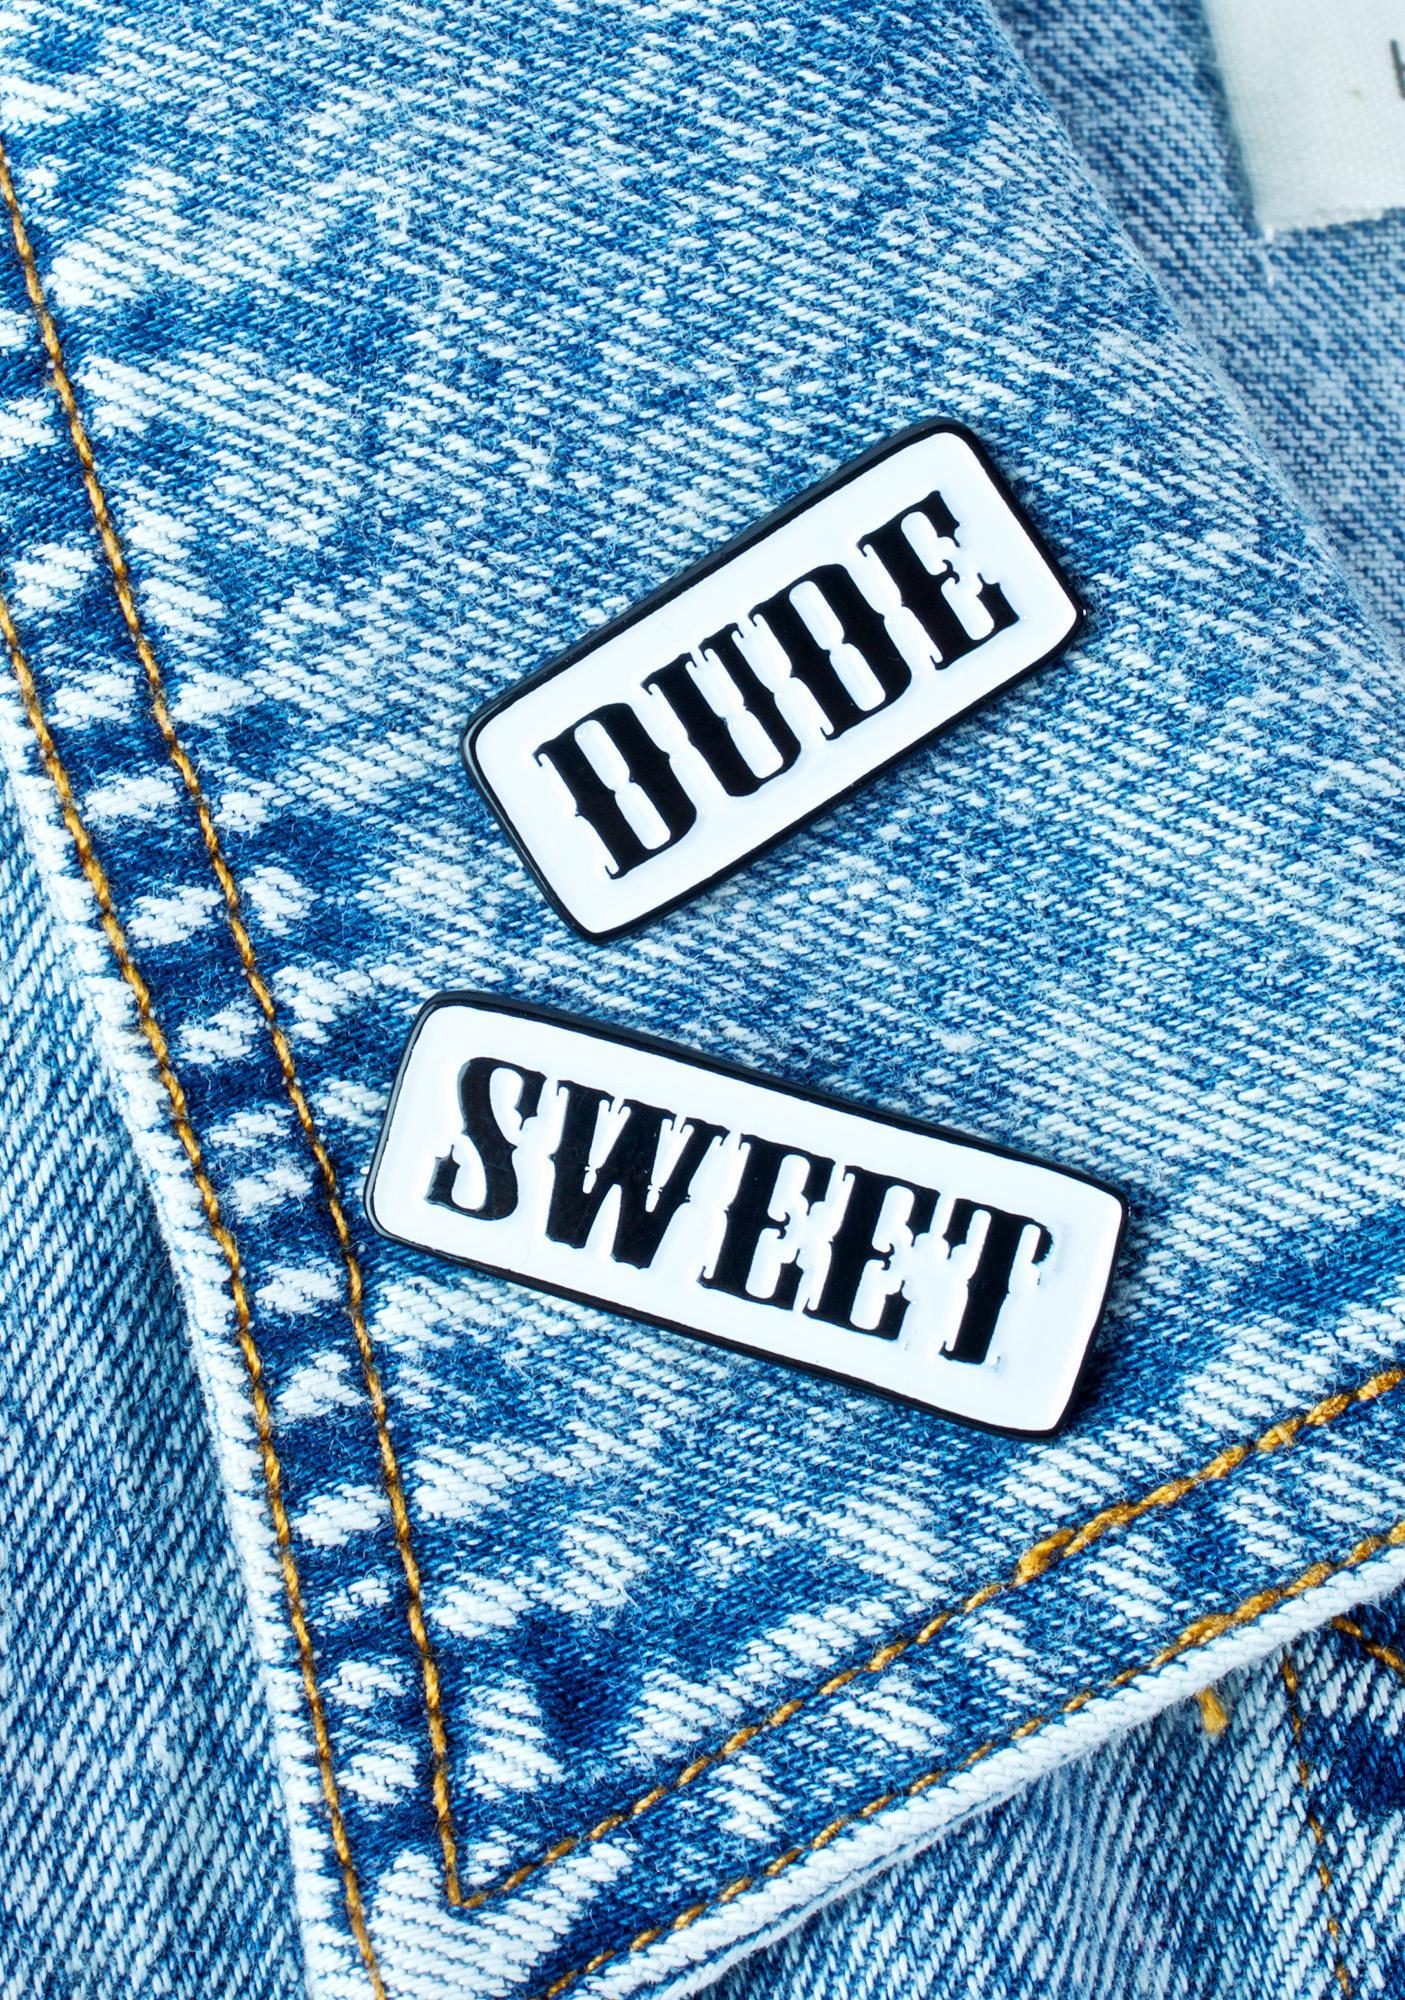 Band of Weirdos Dude Sweet Enamel Pin Set